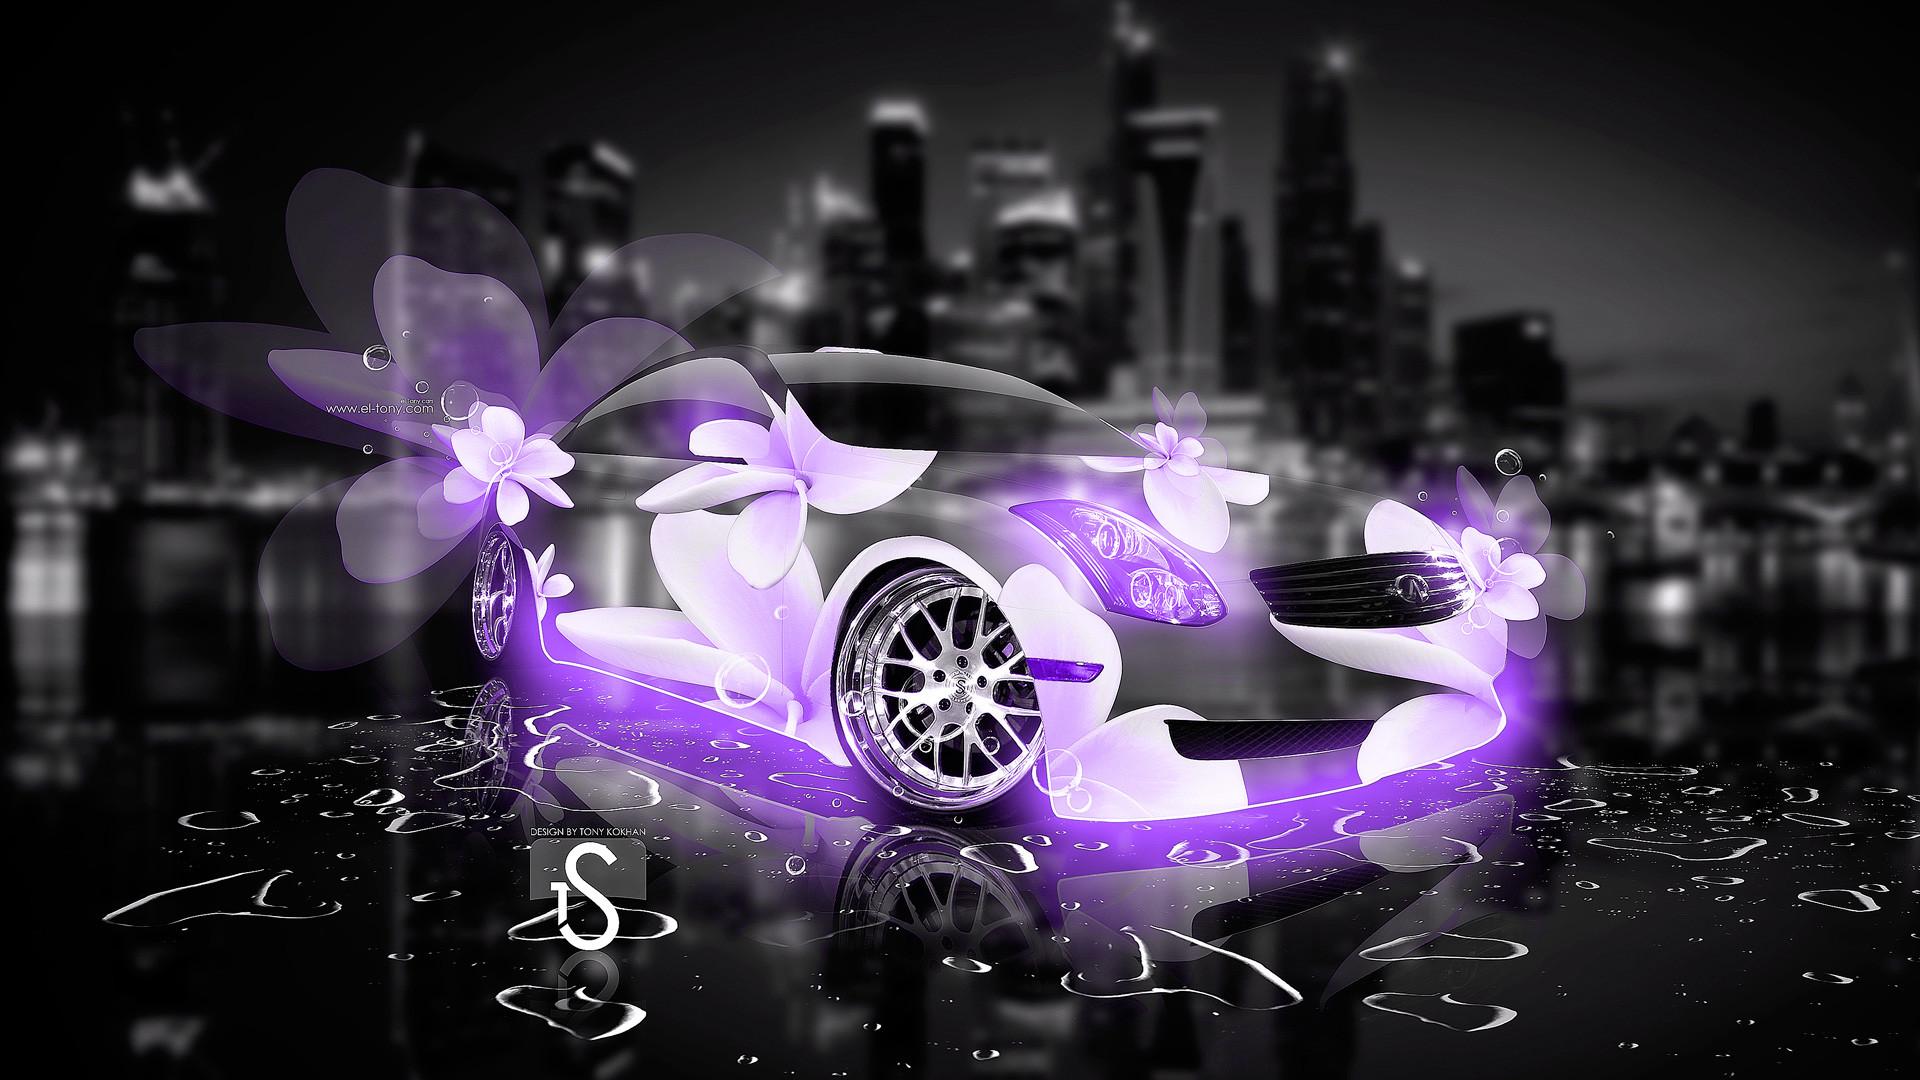 … Infiniti-G35-Fantasy-Violet-Flowers-City-Car-2013-